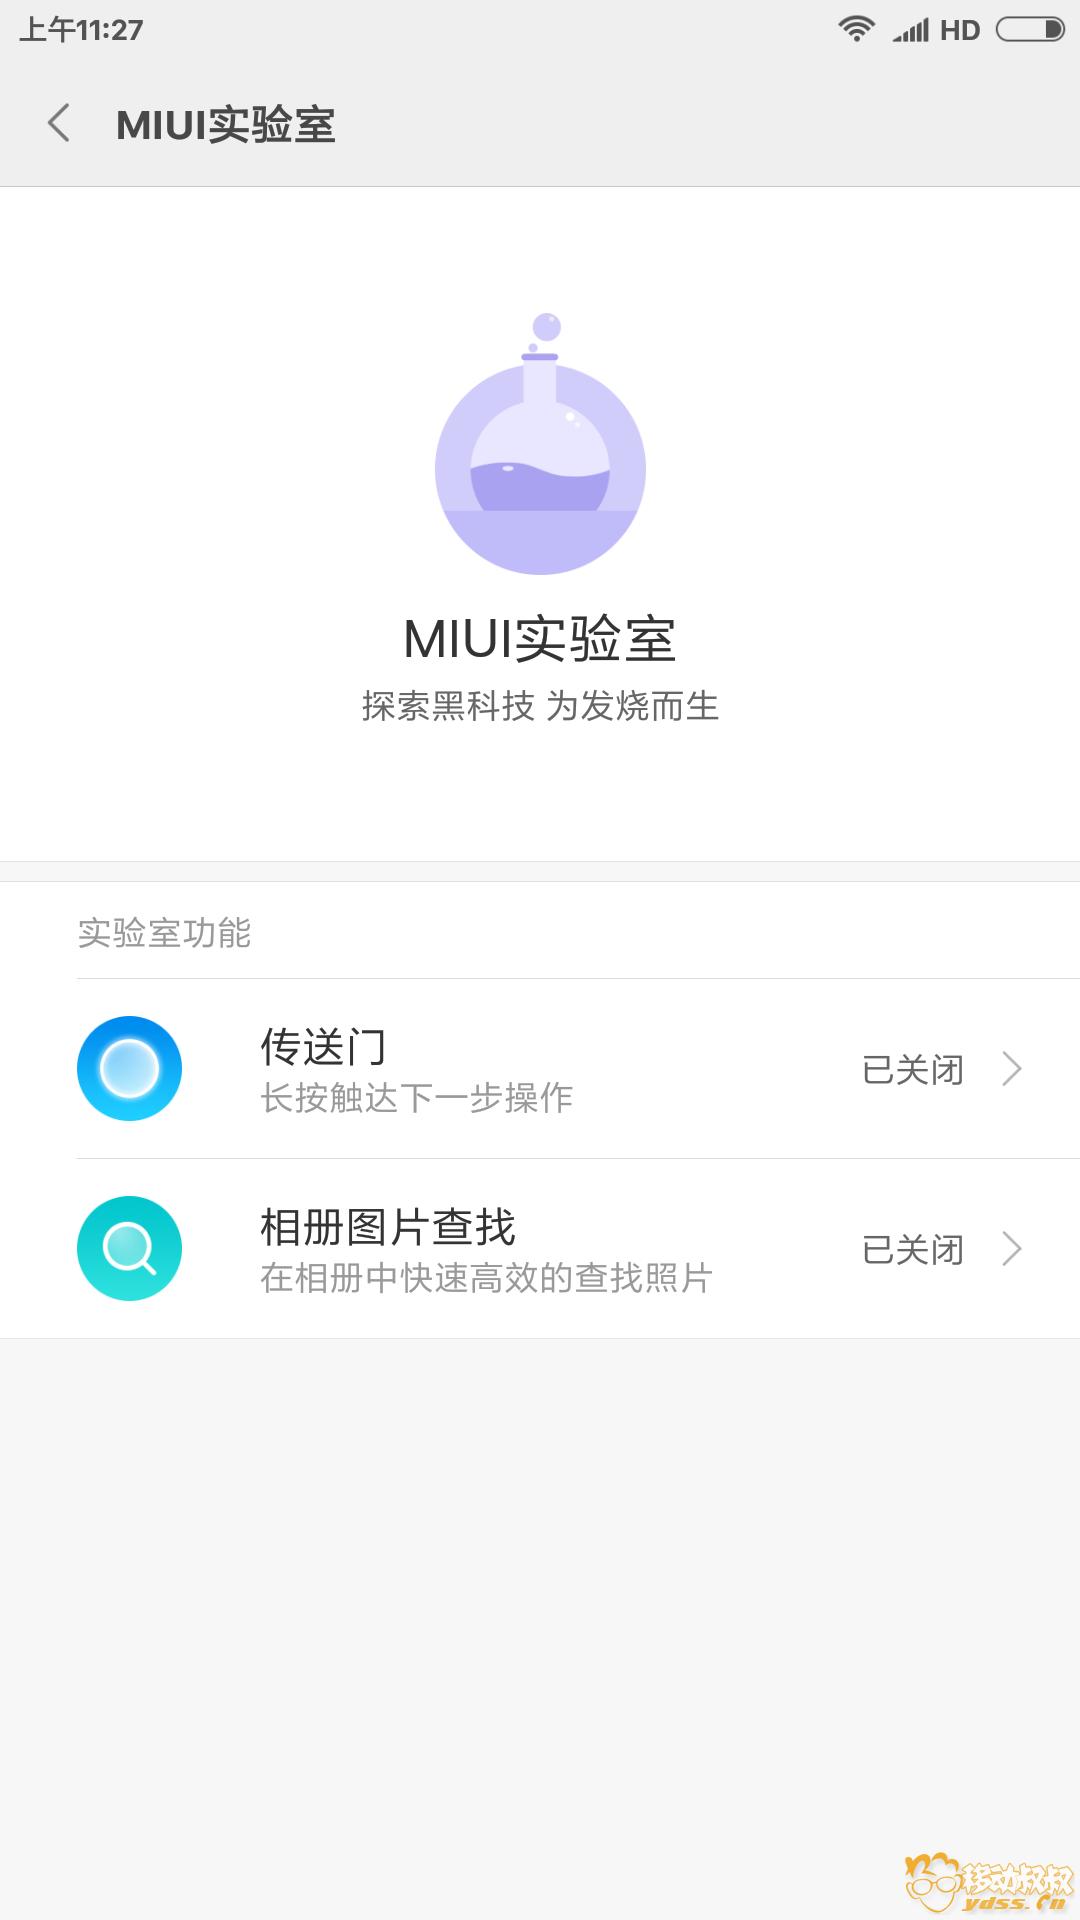 Screenshot_2018-05-04-11-27-11-097_com.android.settings.png